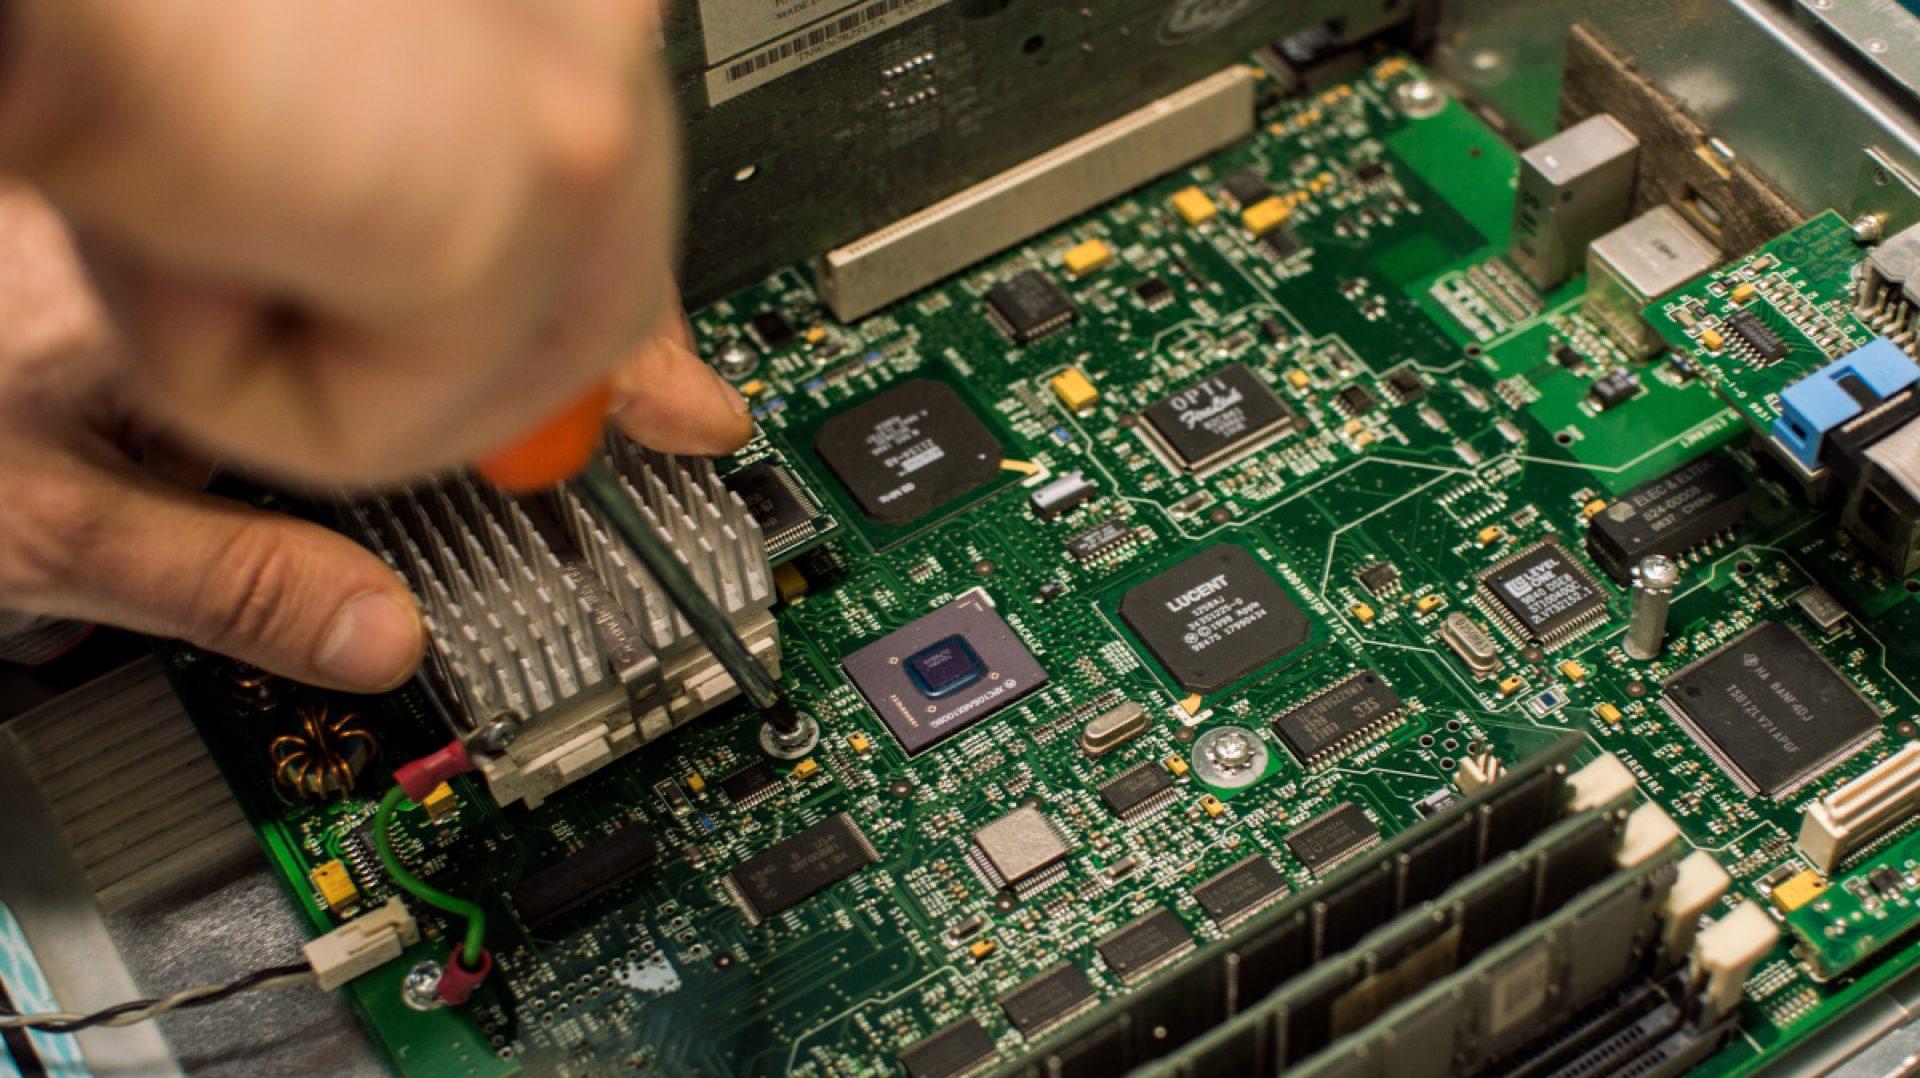 Ocm Computer e Servizi